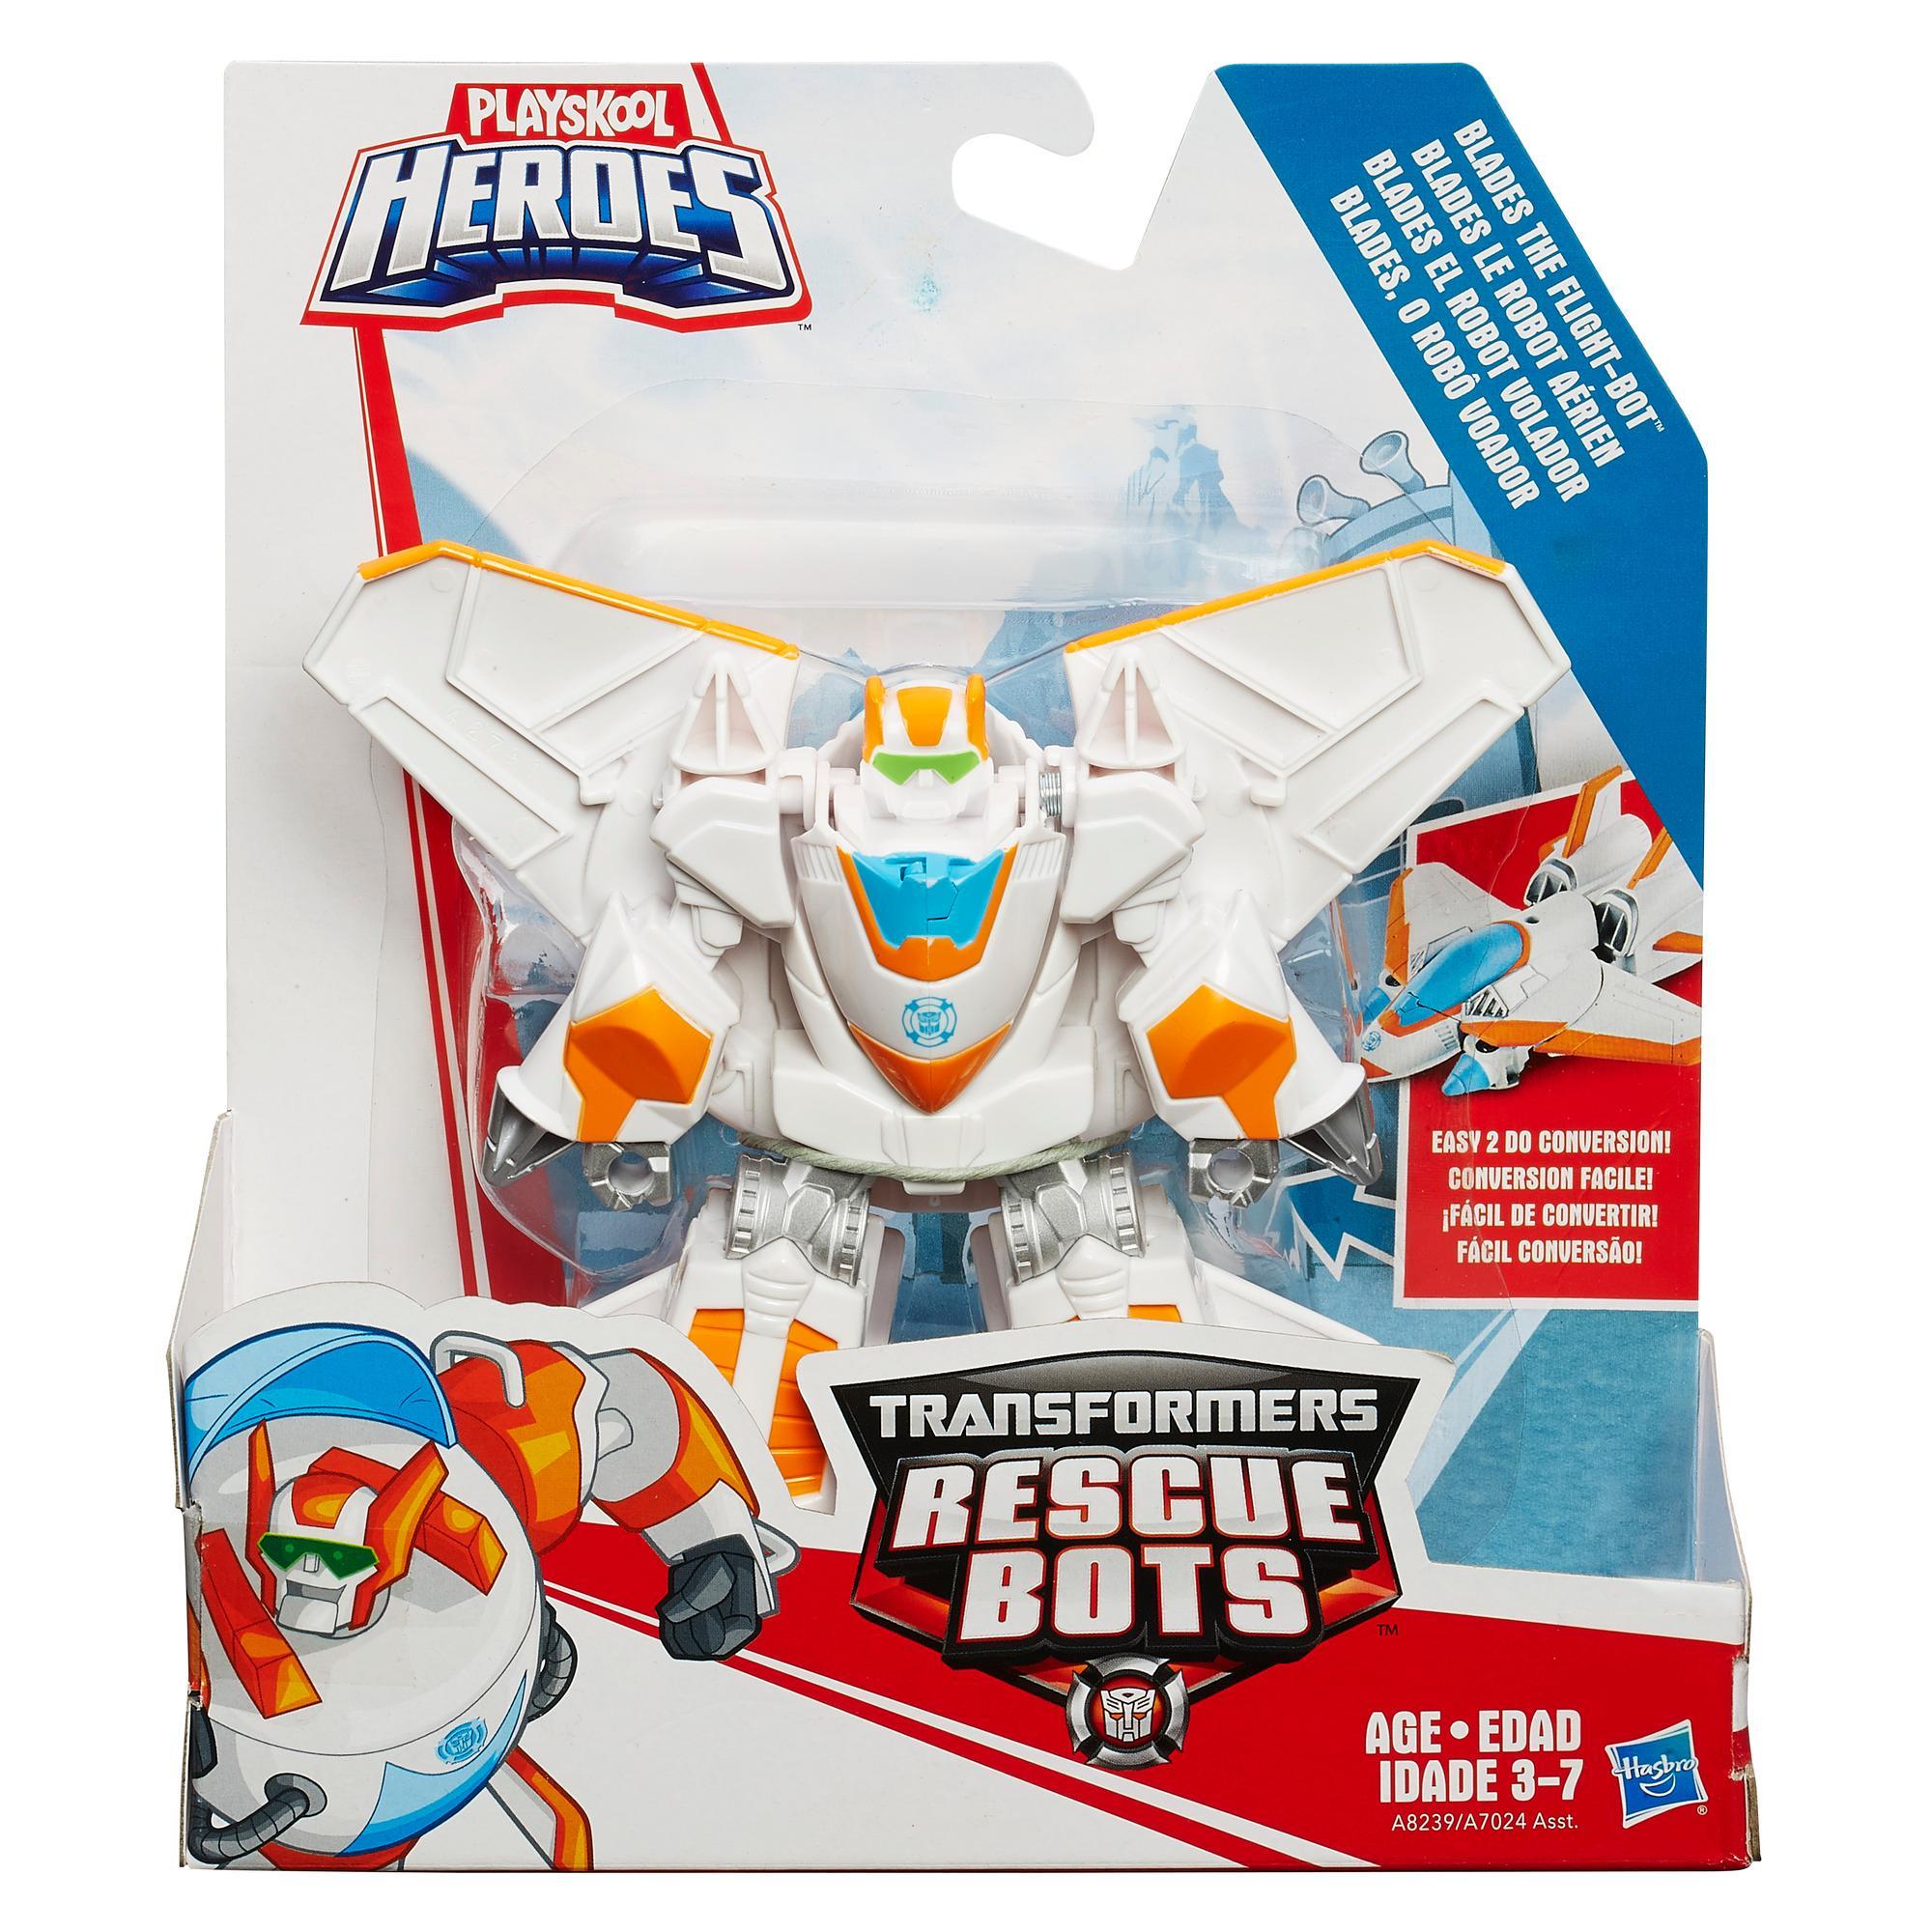 Playskool heroes transformers rescue bots blades the